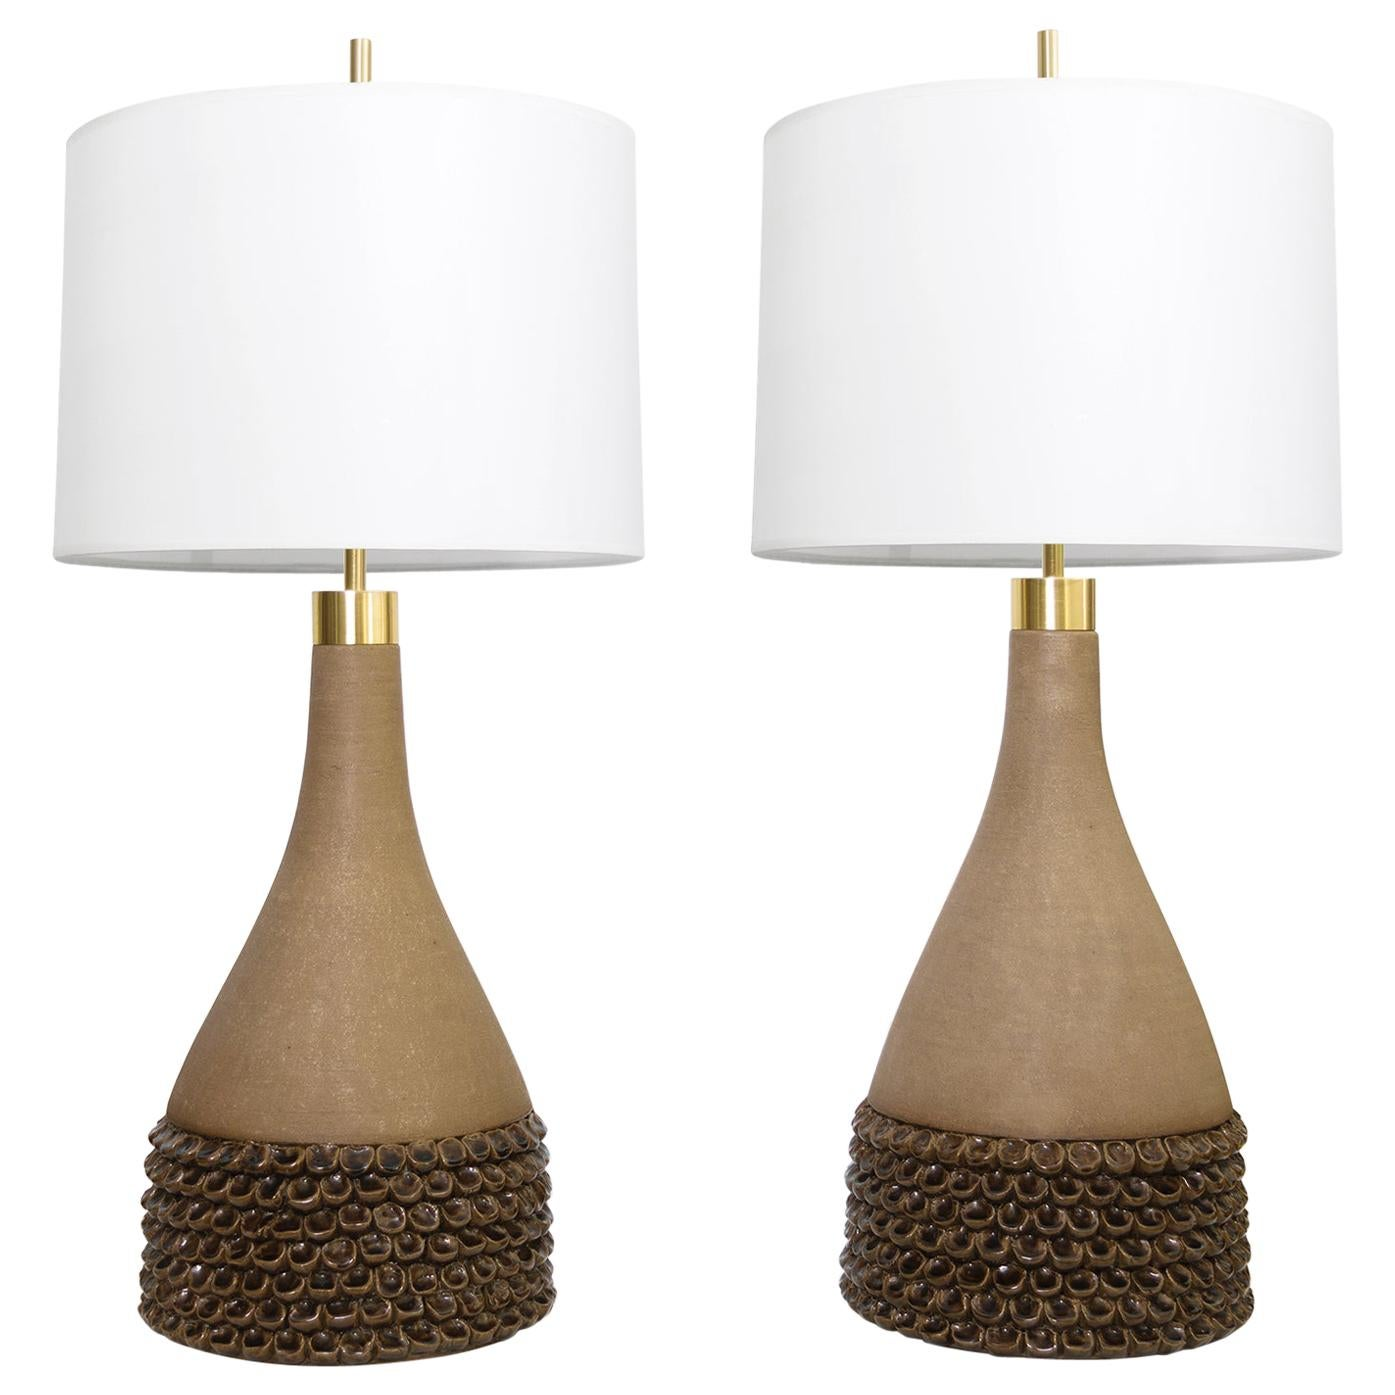 Aage Rasmus Selsbo Large Pair of Ceramic Lamps Studio Selsbo Keramik, Denmark